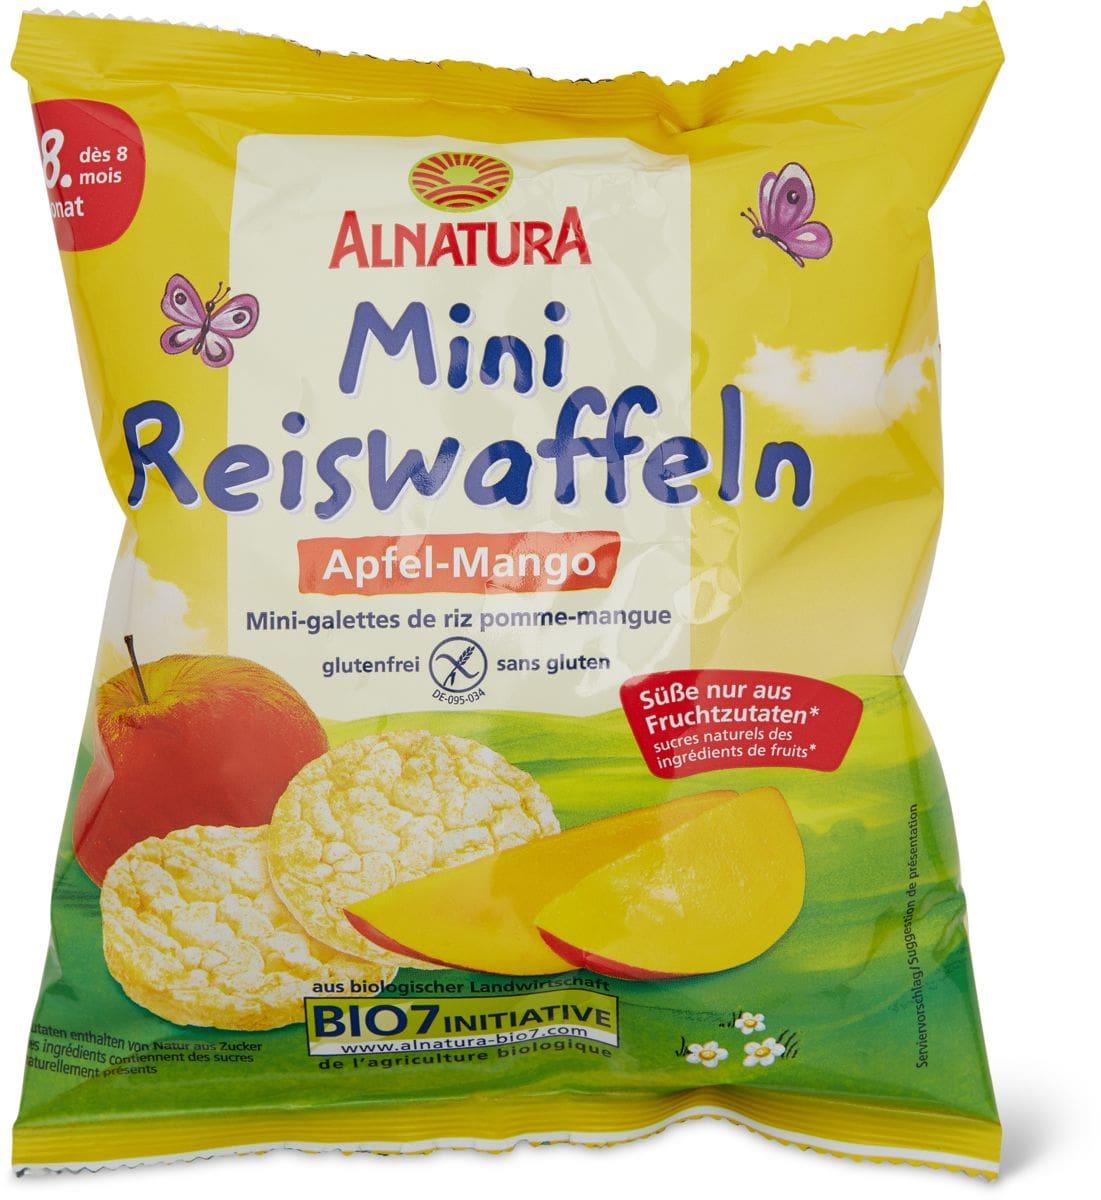 Alnatura Mini-galettes de riz pomme-mangue